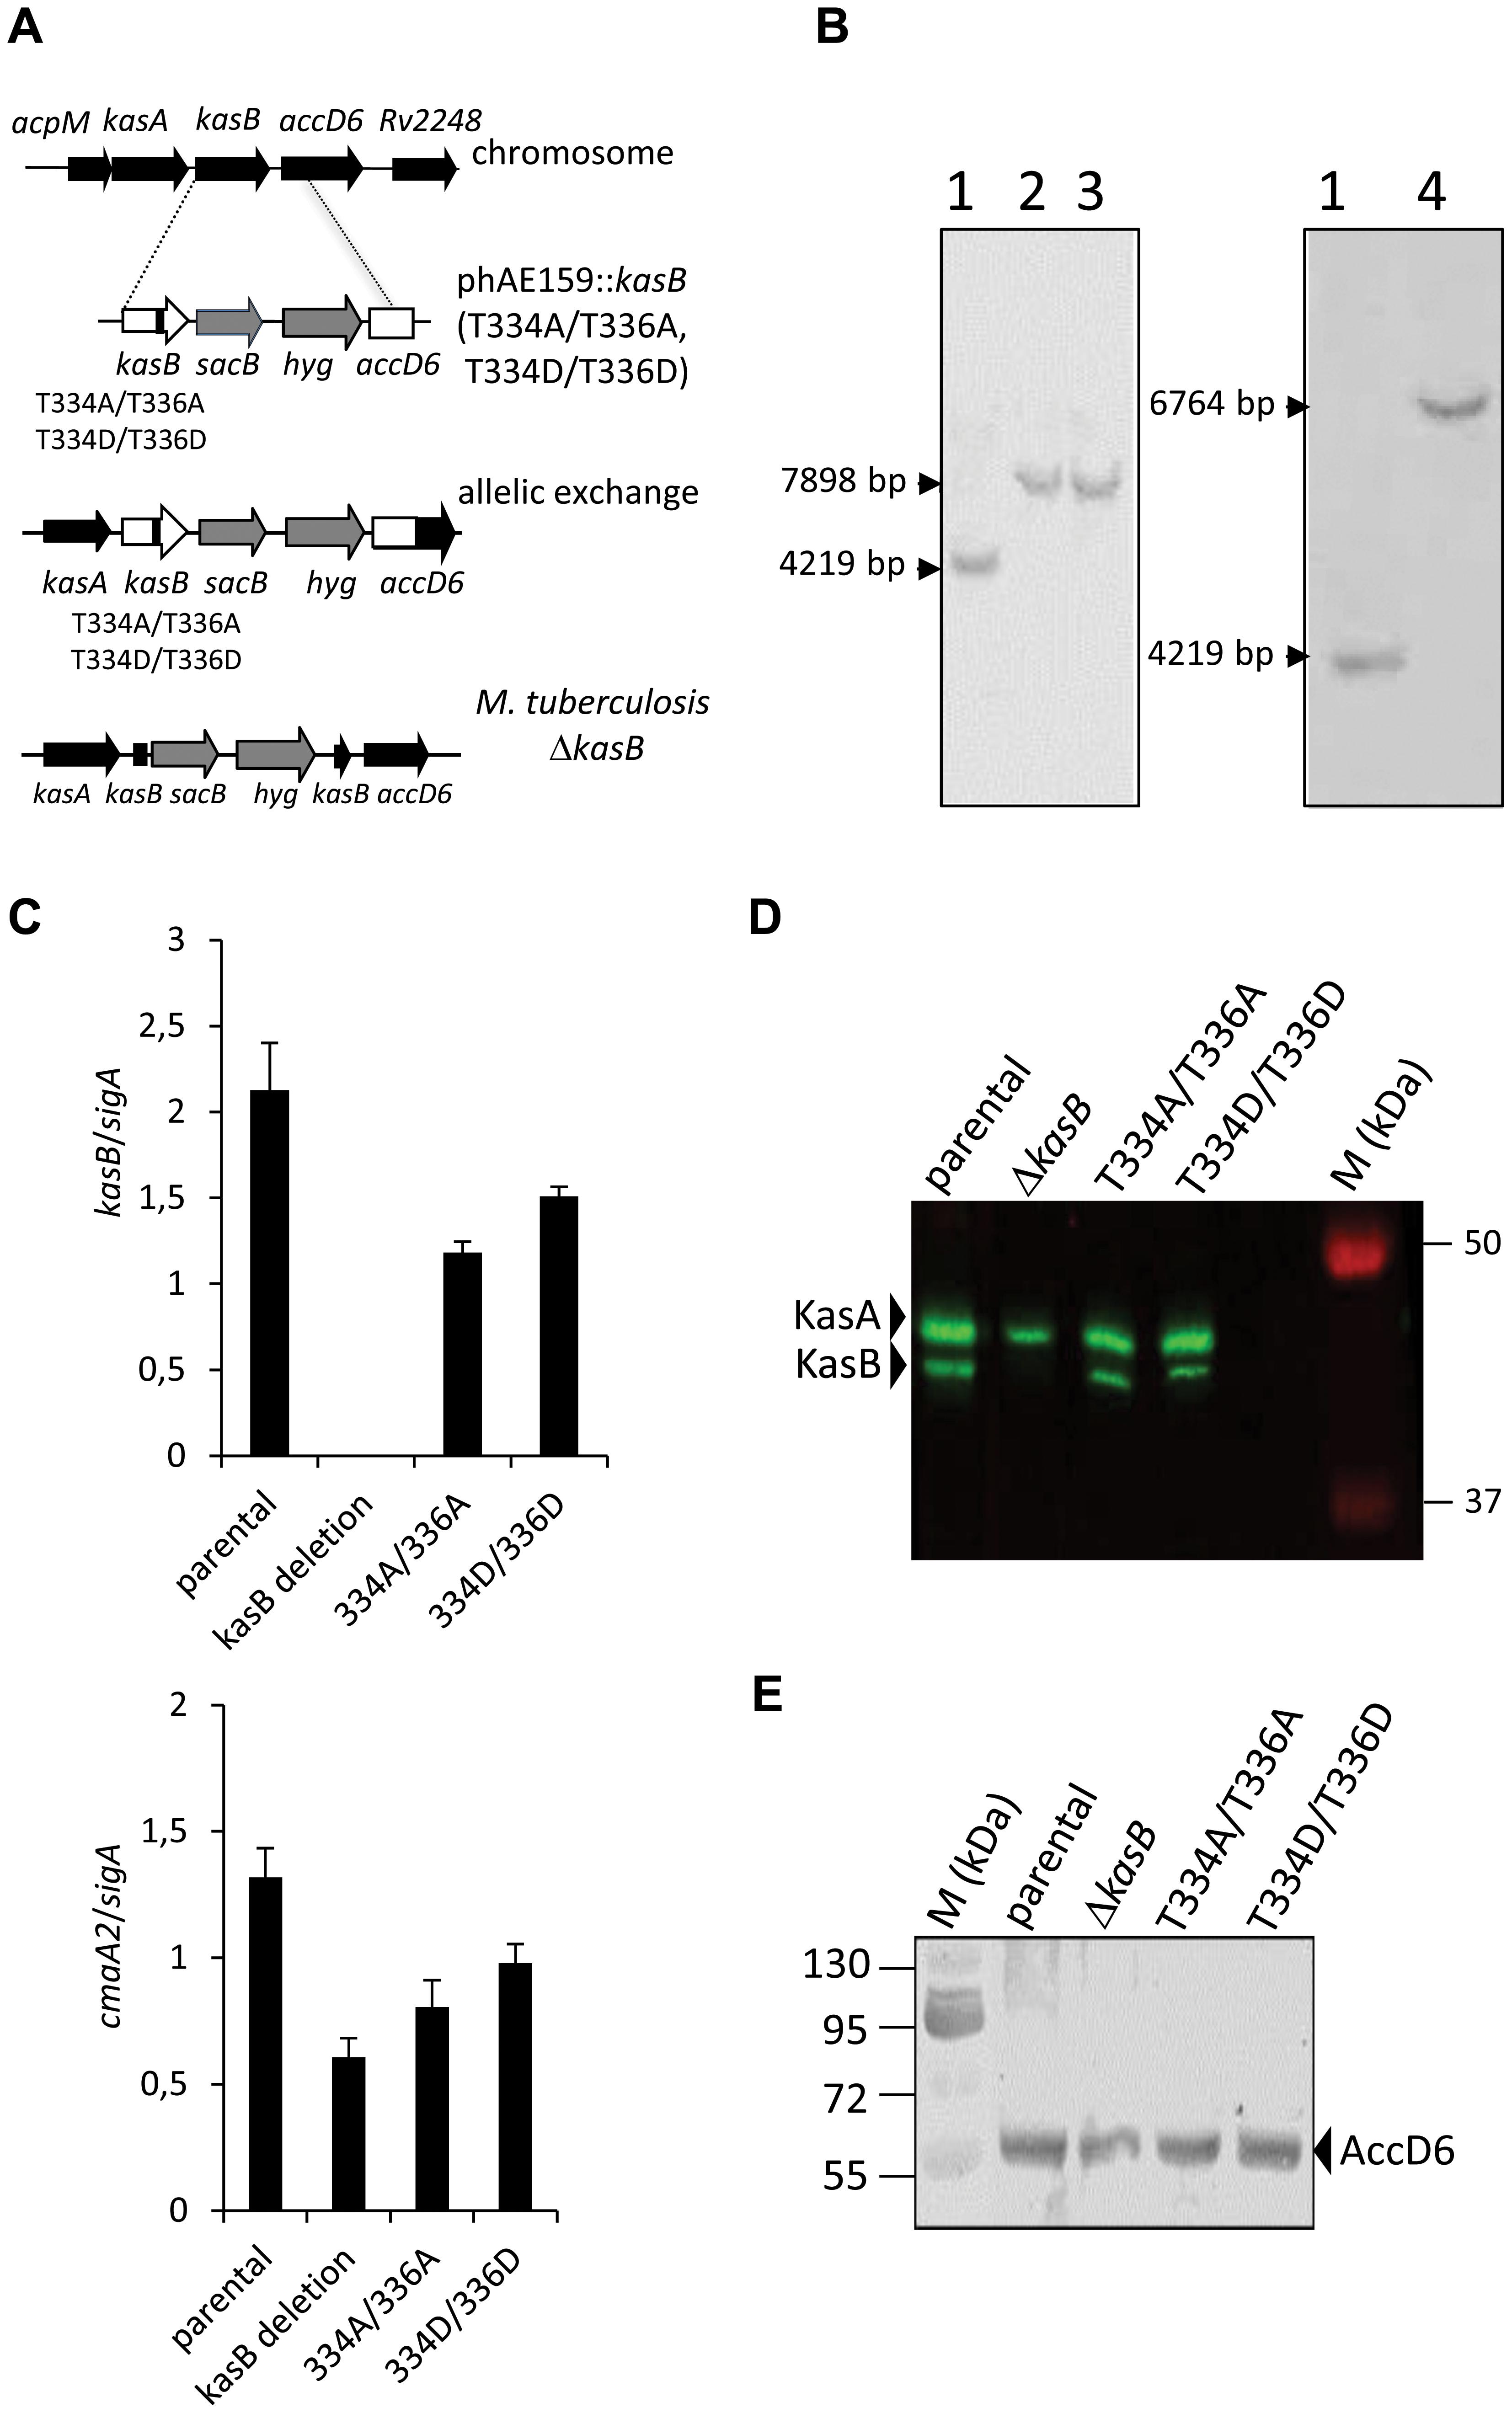 Construction of isogenic <i>M. tuberculosis</i> CDC1551 strains bearing the phosphoablative or phosphomimetic <i>kasB</i> alleles.